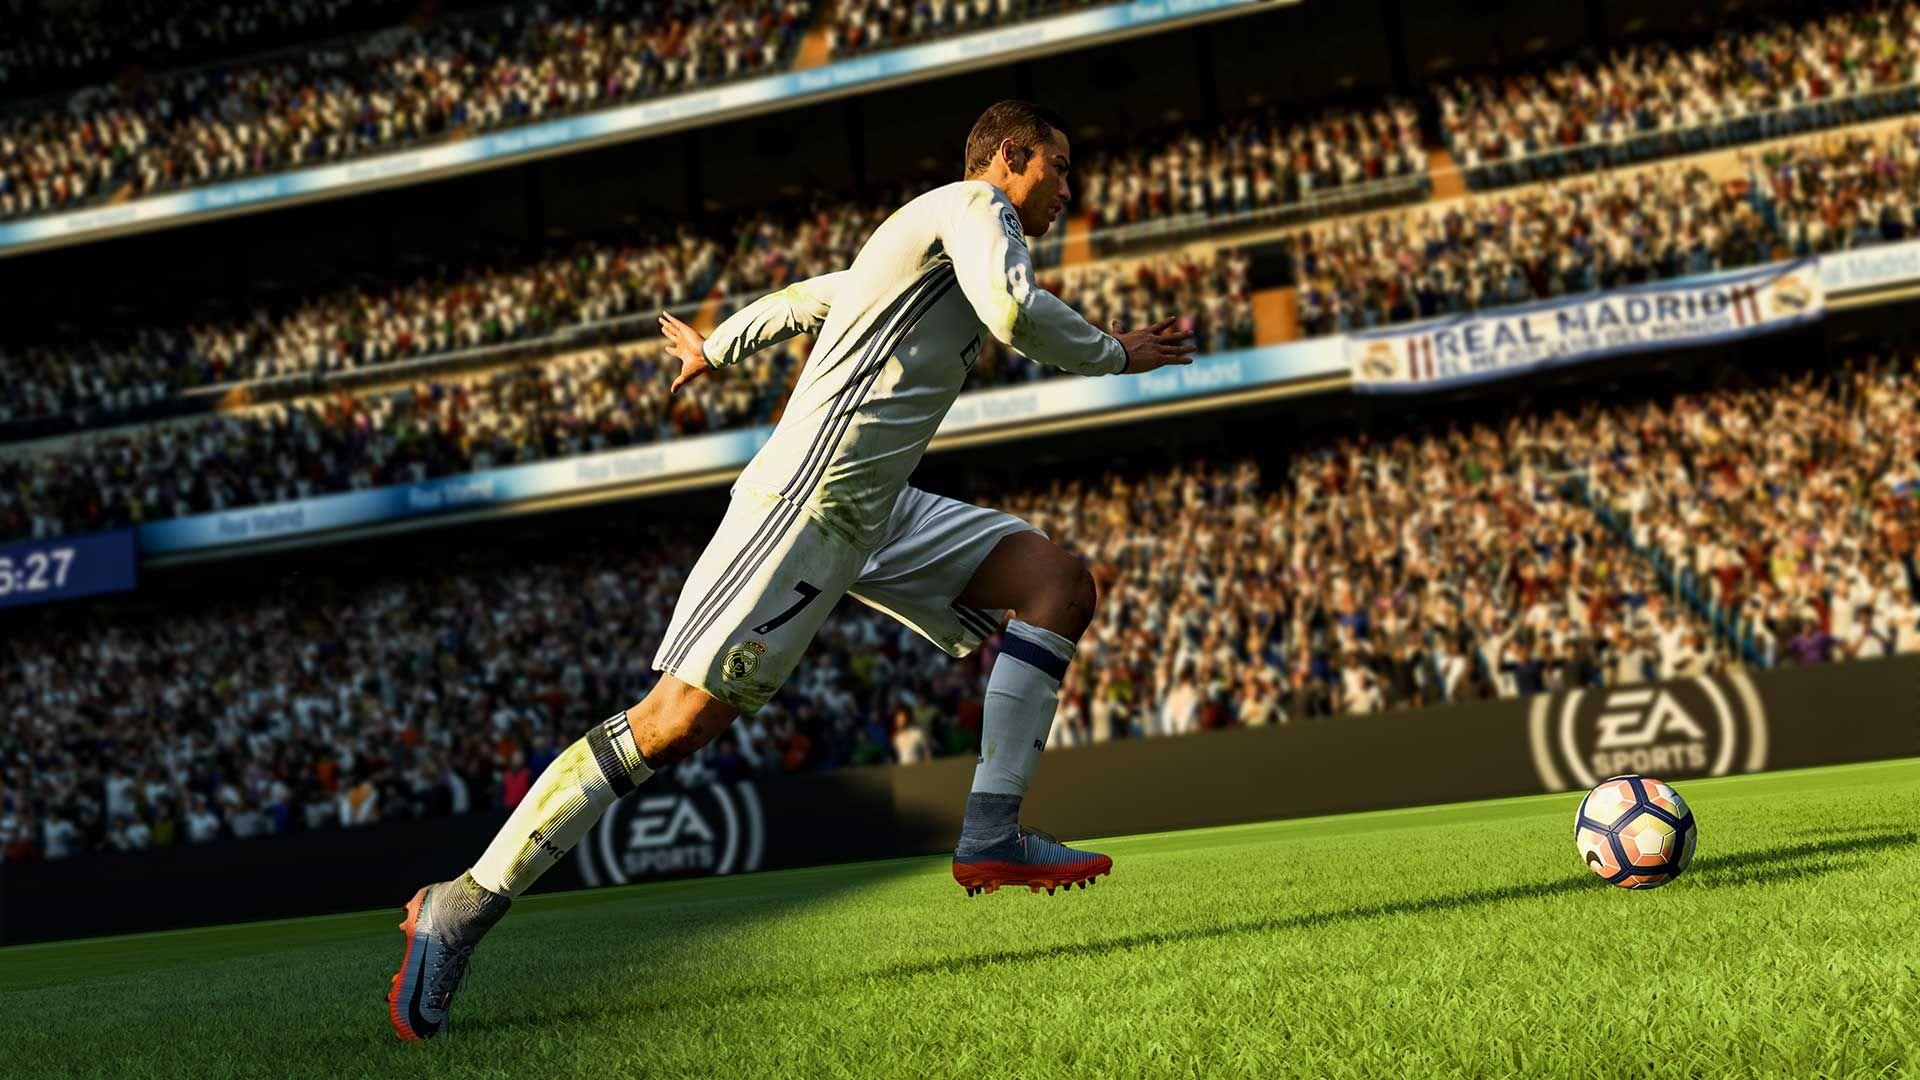 fifa18_pdp_screenshot_ronaldo_gameplay_en_ww_v1